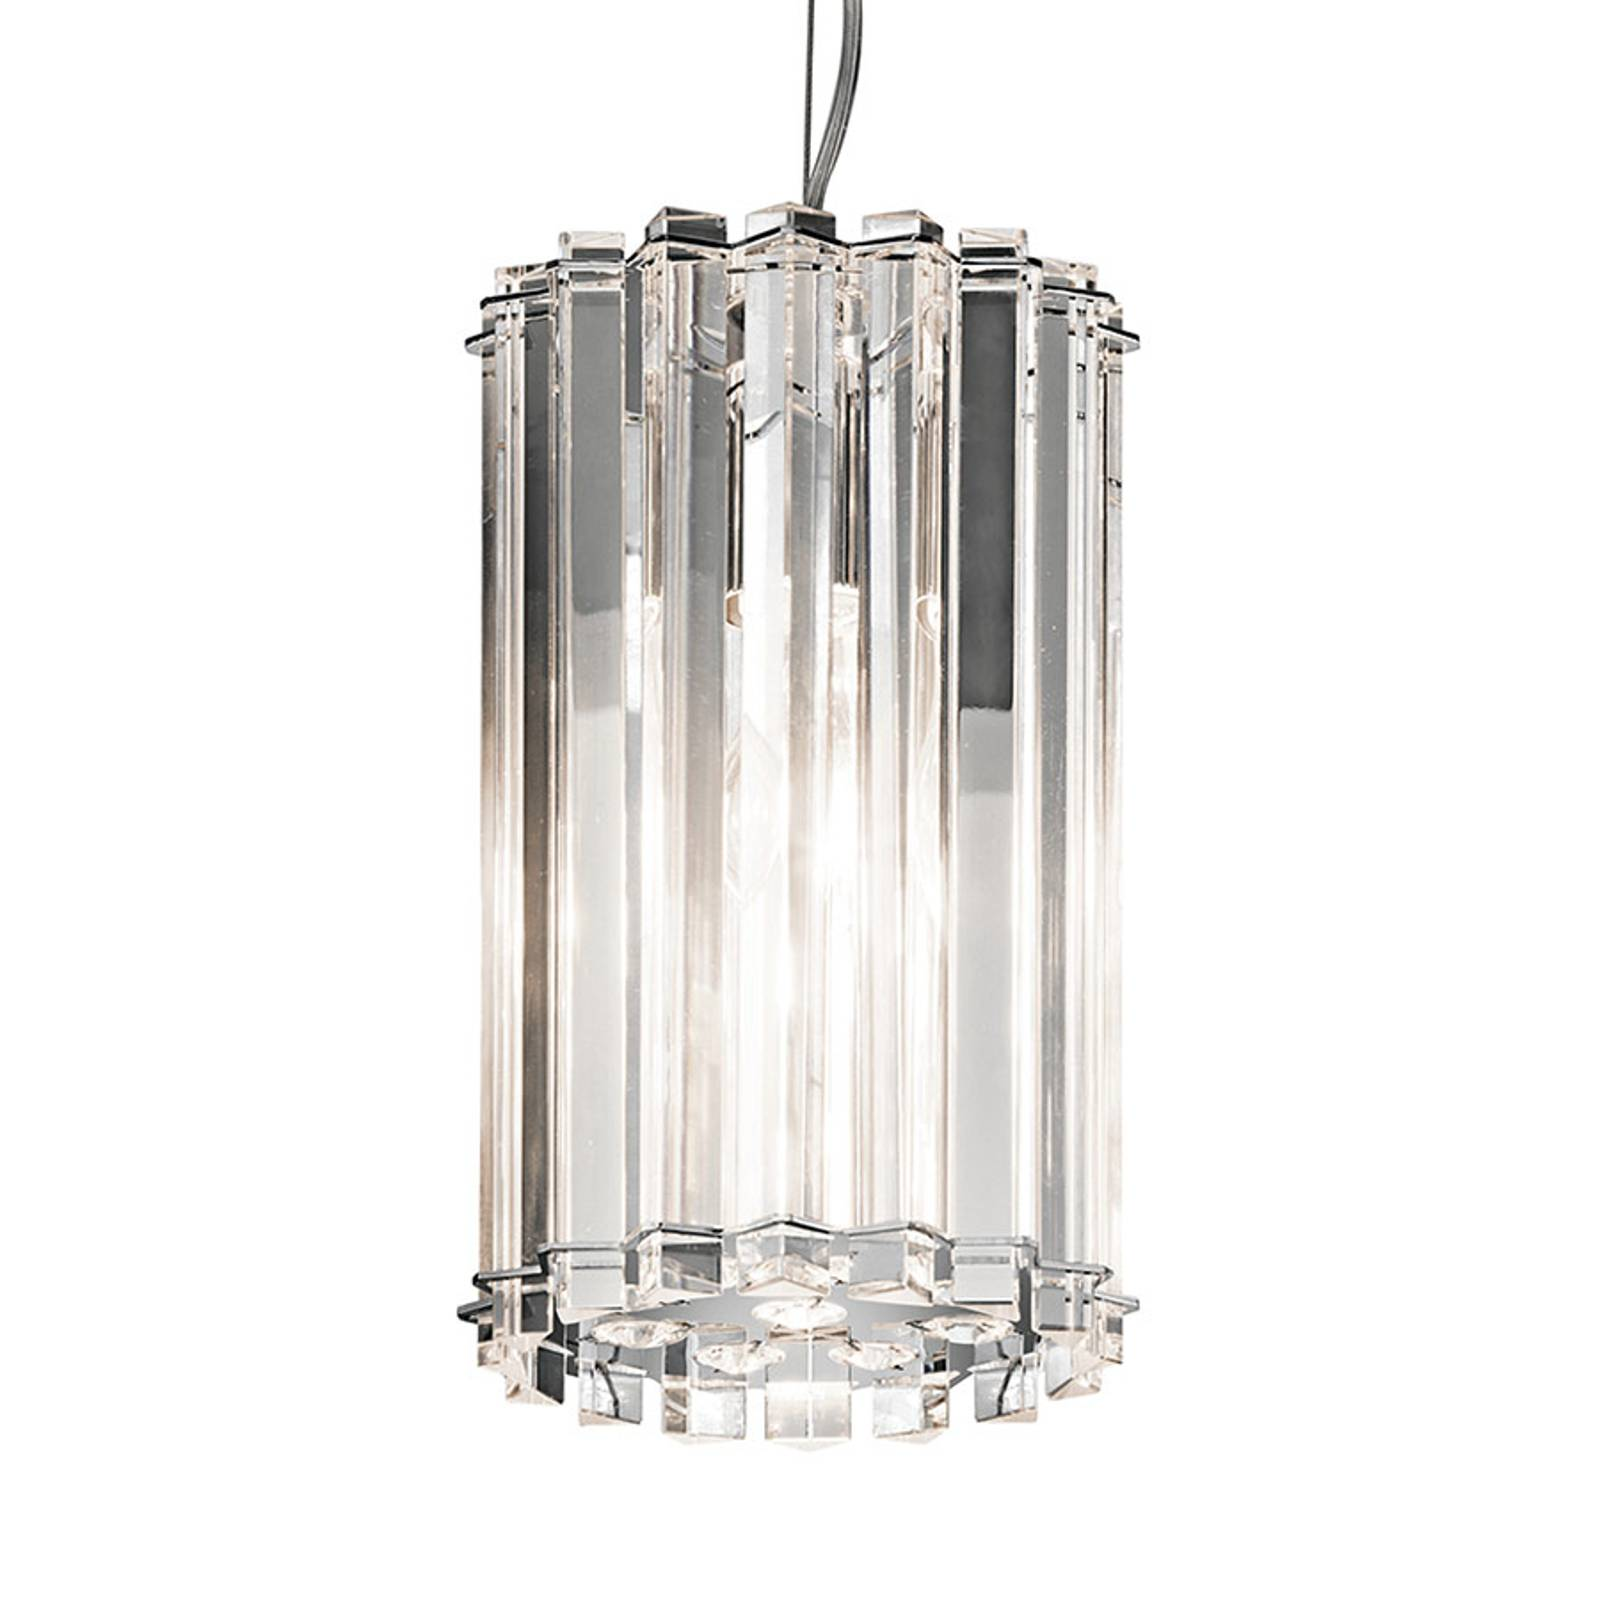 Lampa wisząca LED Crystal Skye, Ø 16,7 cm